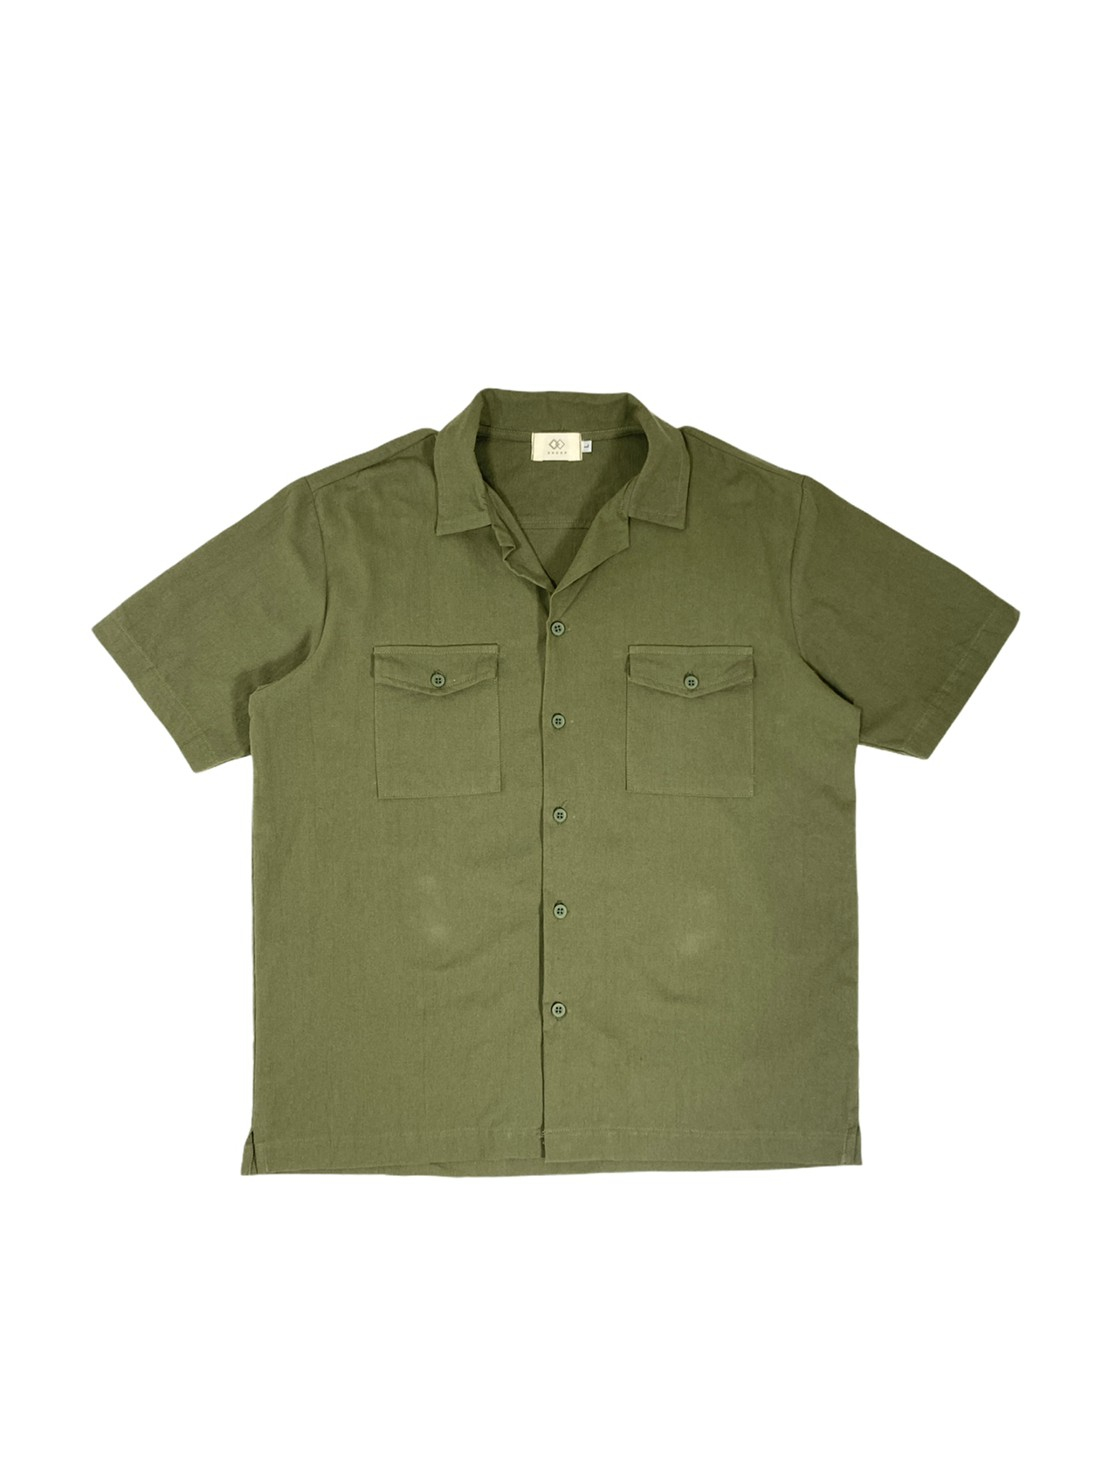 Open Collar 2pocket (Green)